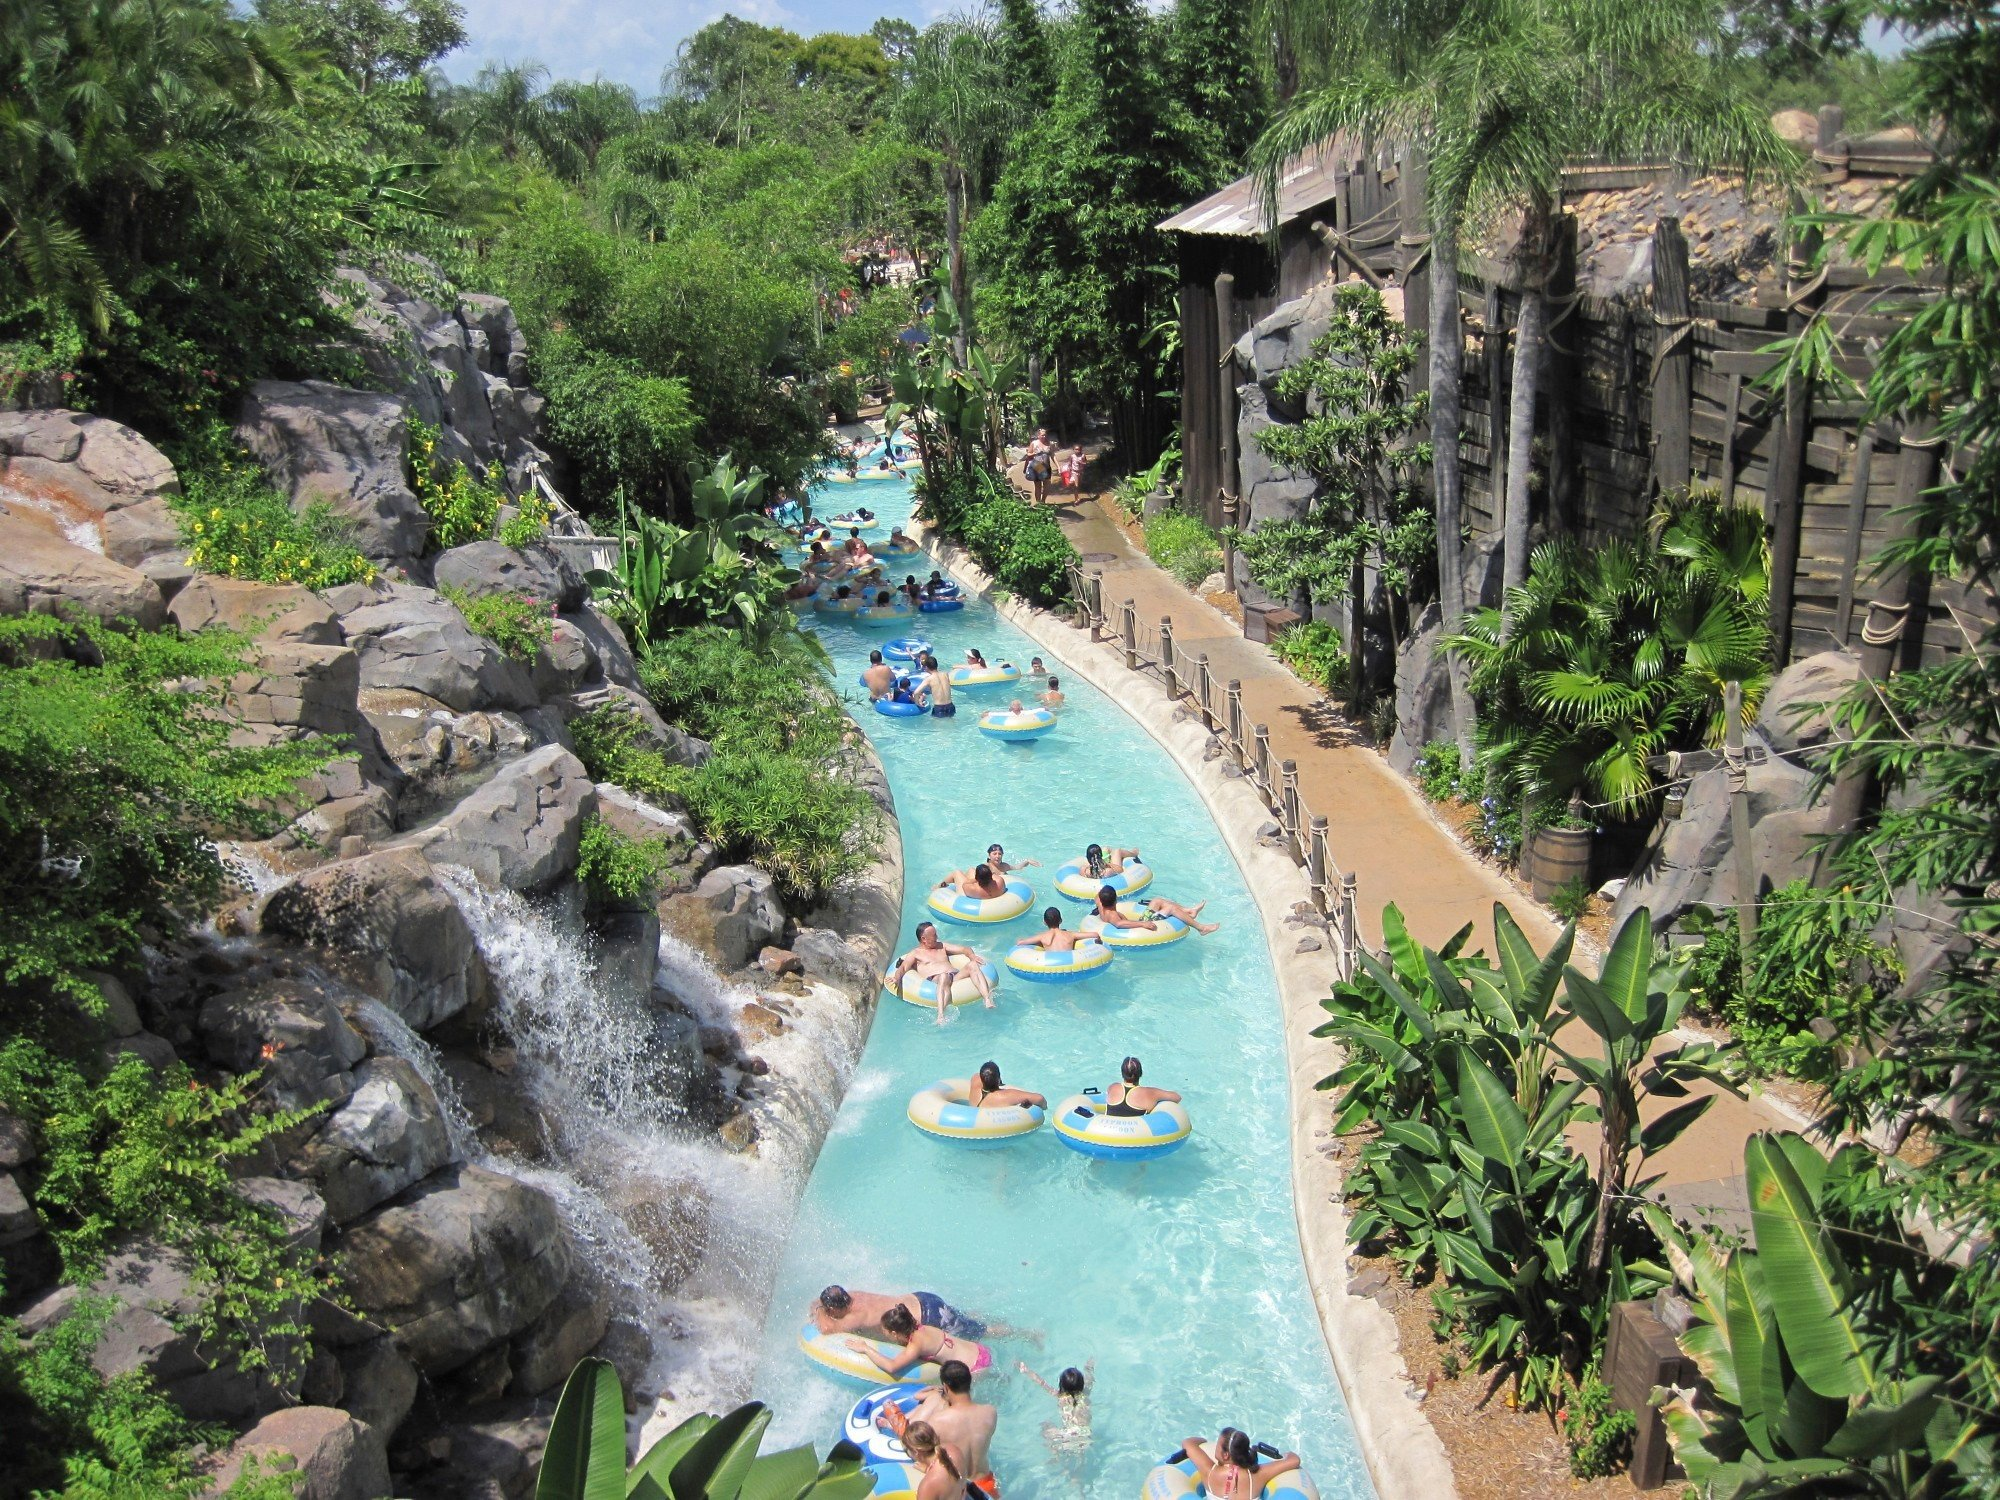 Trip Ideas tree outdoor rock Nature vacation tourism amusement park Resort Jungle park Water park water feature rainforest Waterfall stone